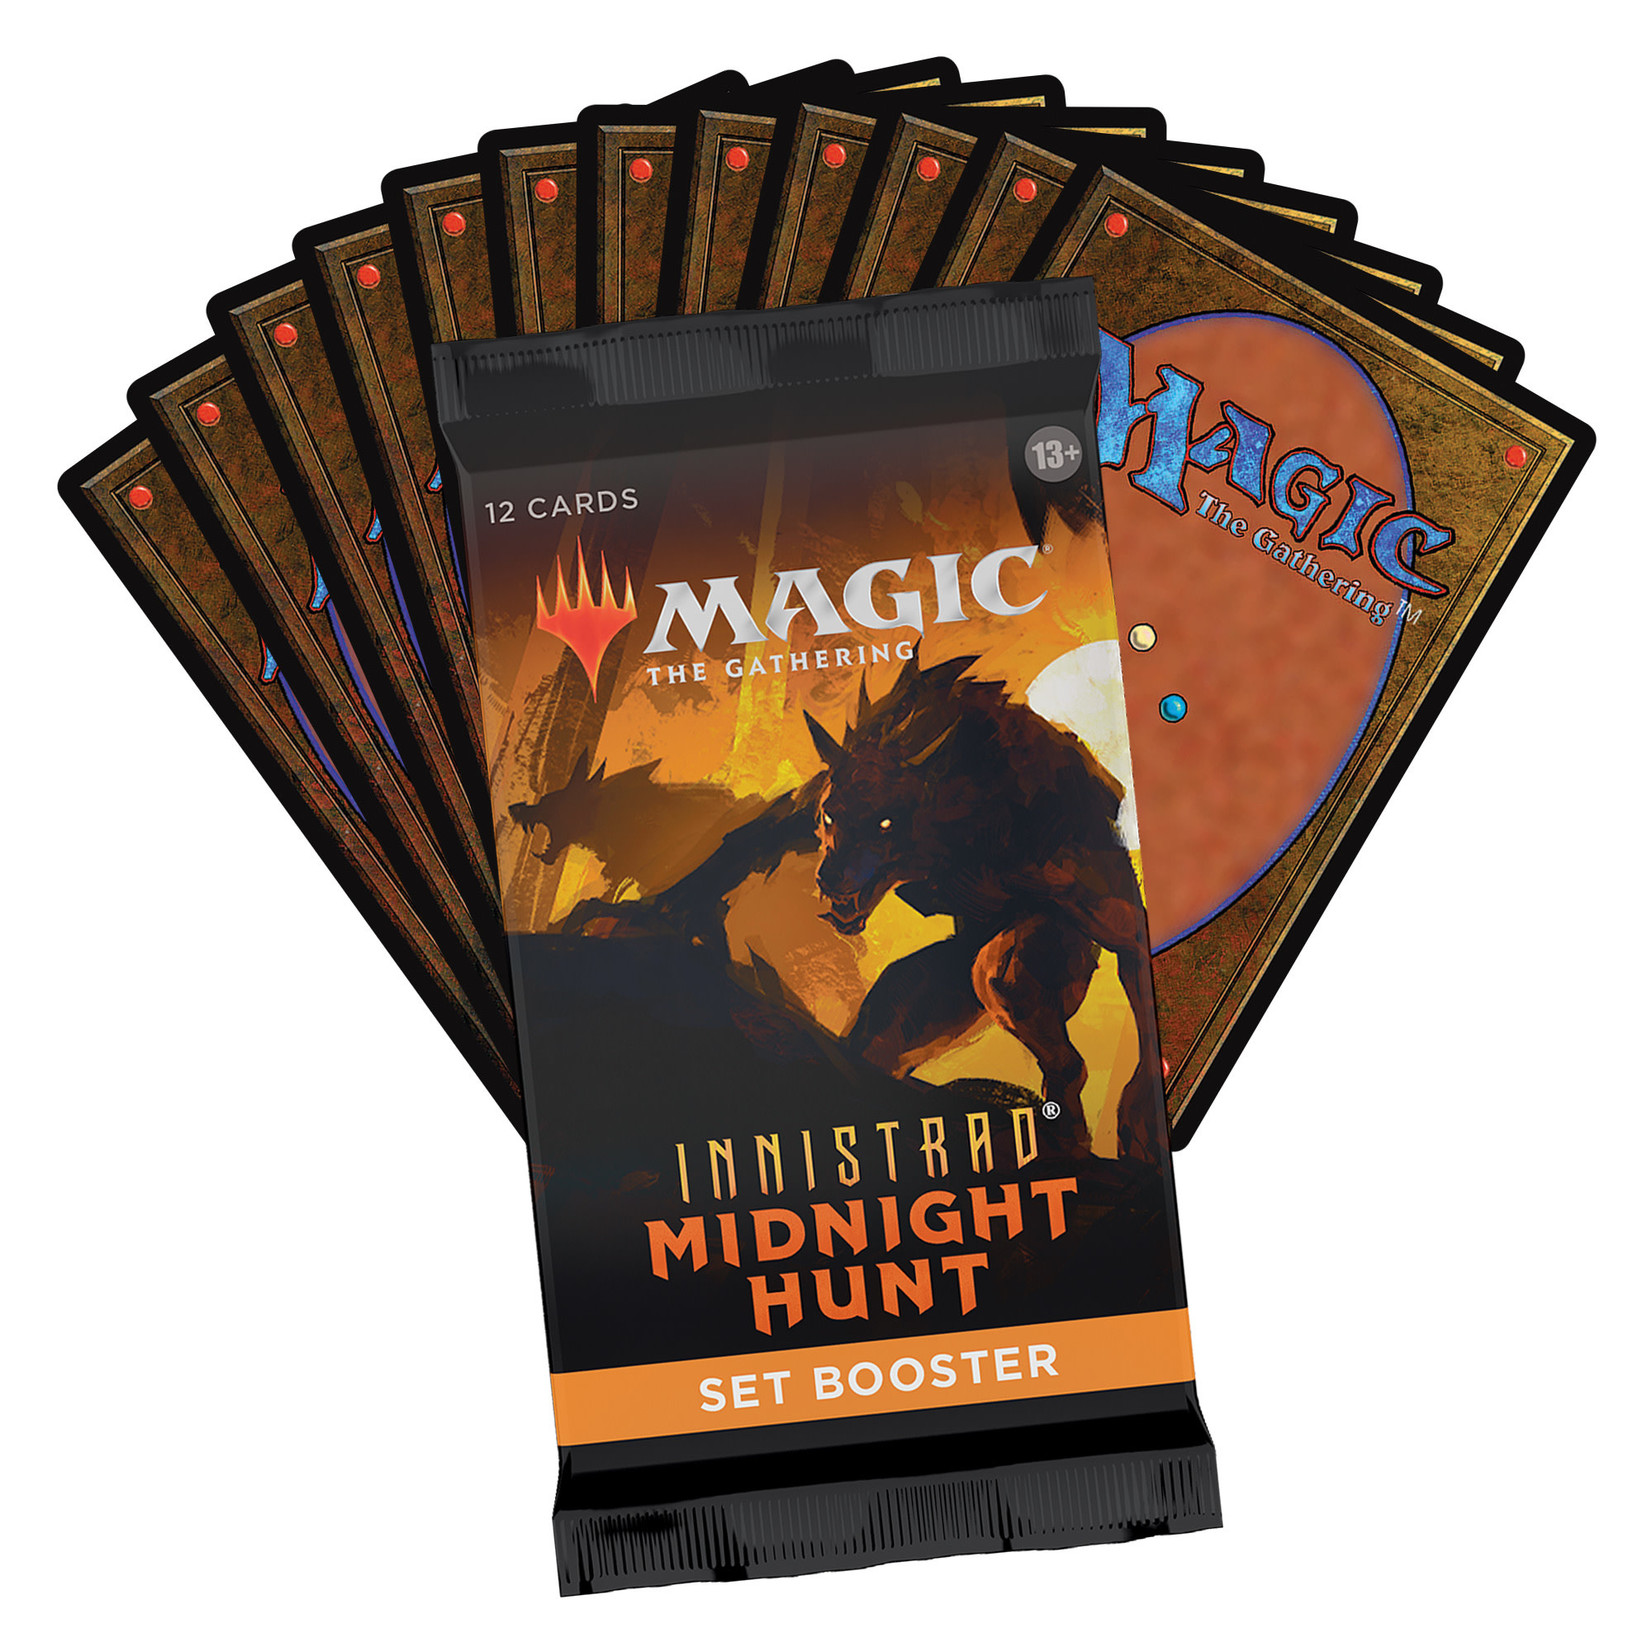 Magic: The Gathering Magic: The Gathering - Innistrad: Midnight Hunt Set Booster Box